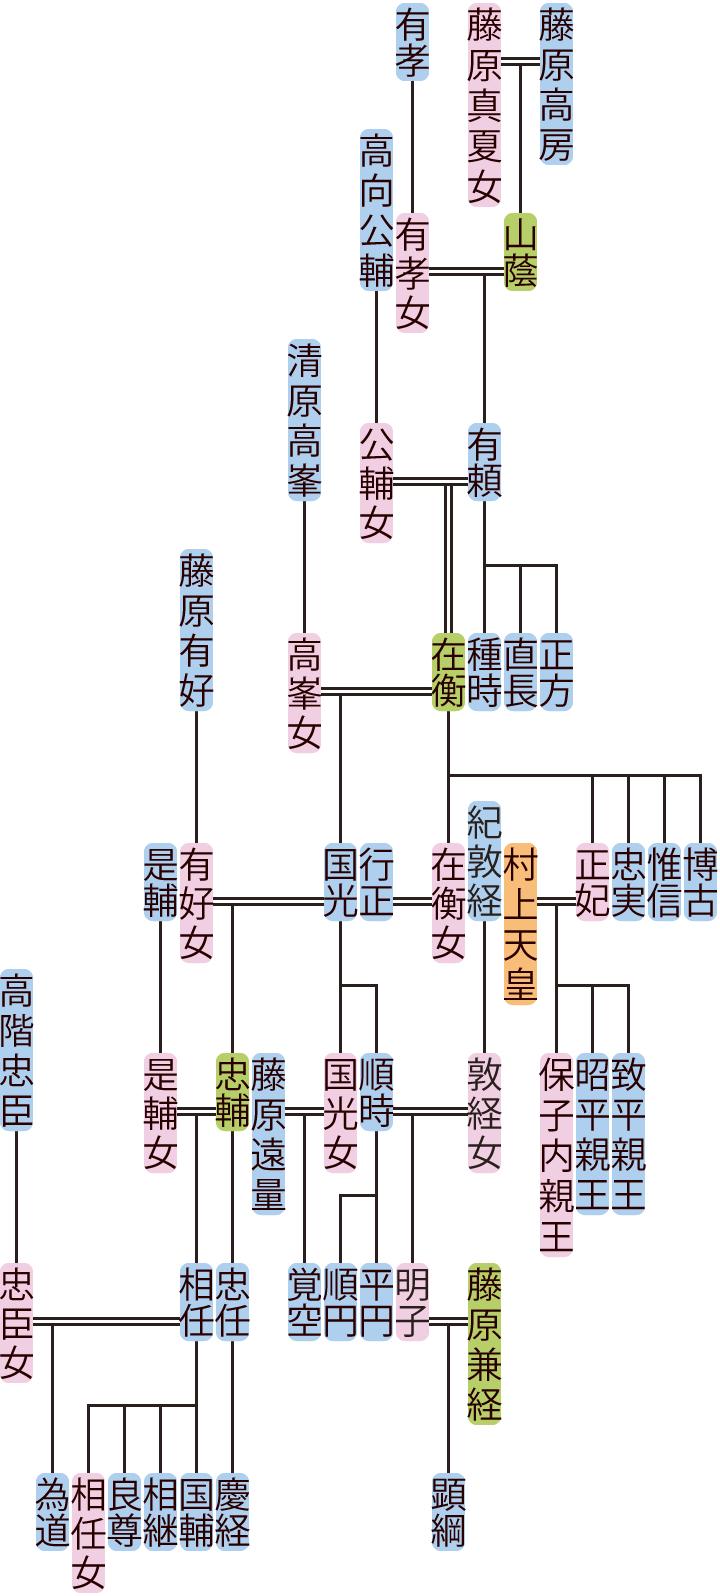 藤原有頼~忠輔の系図